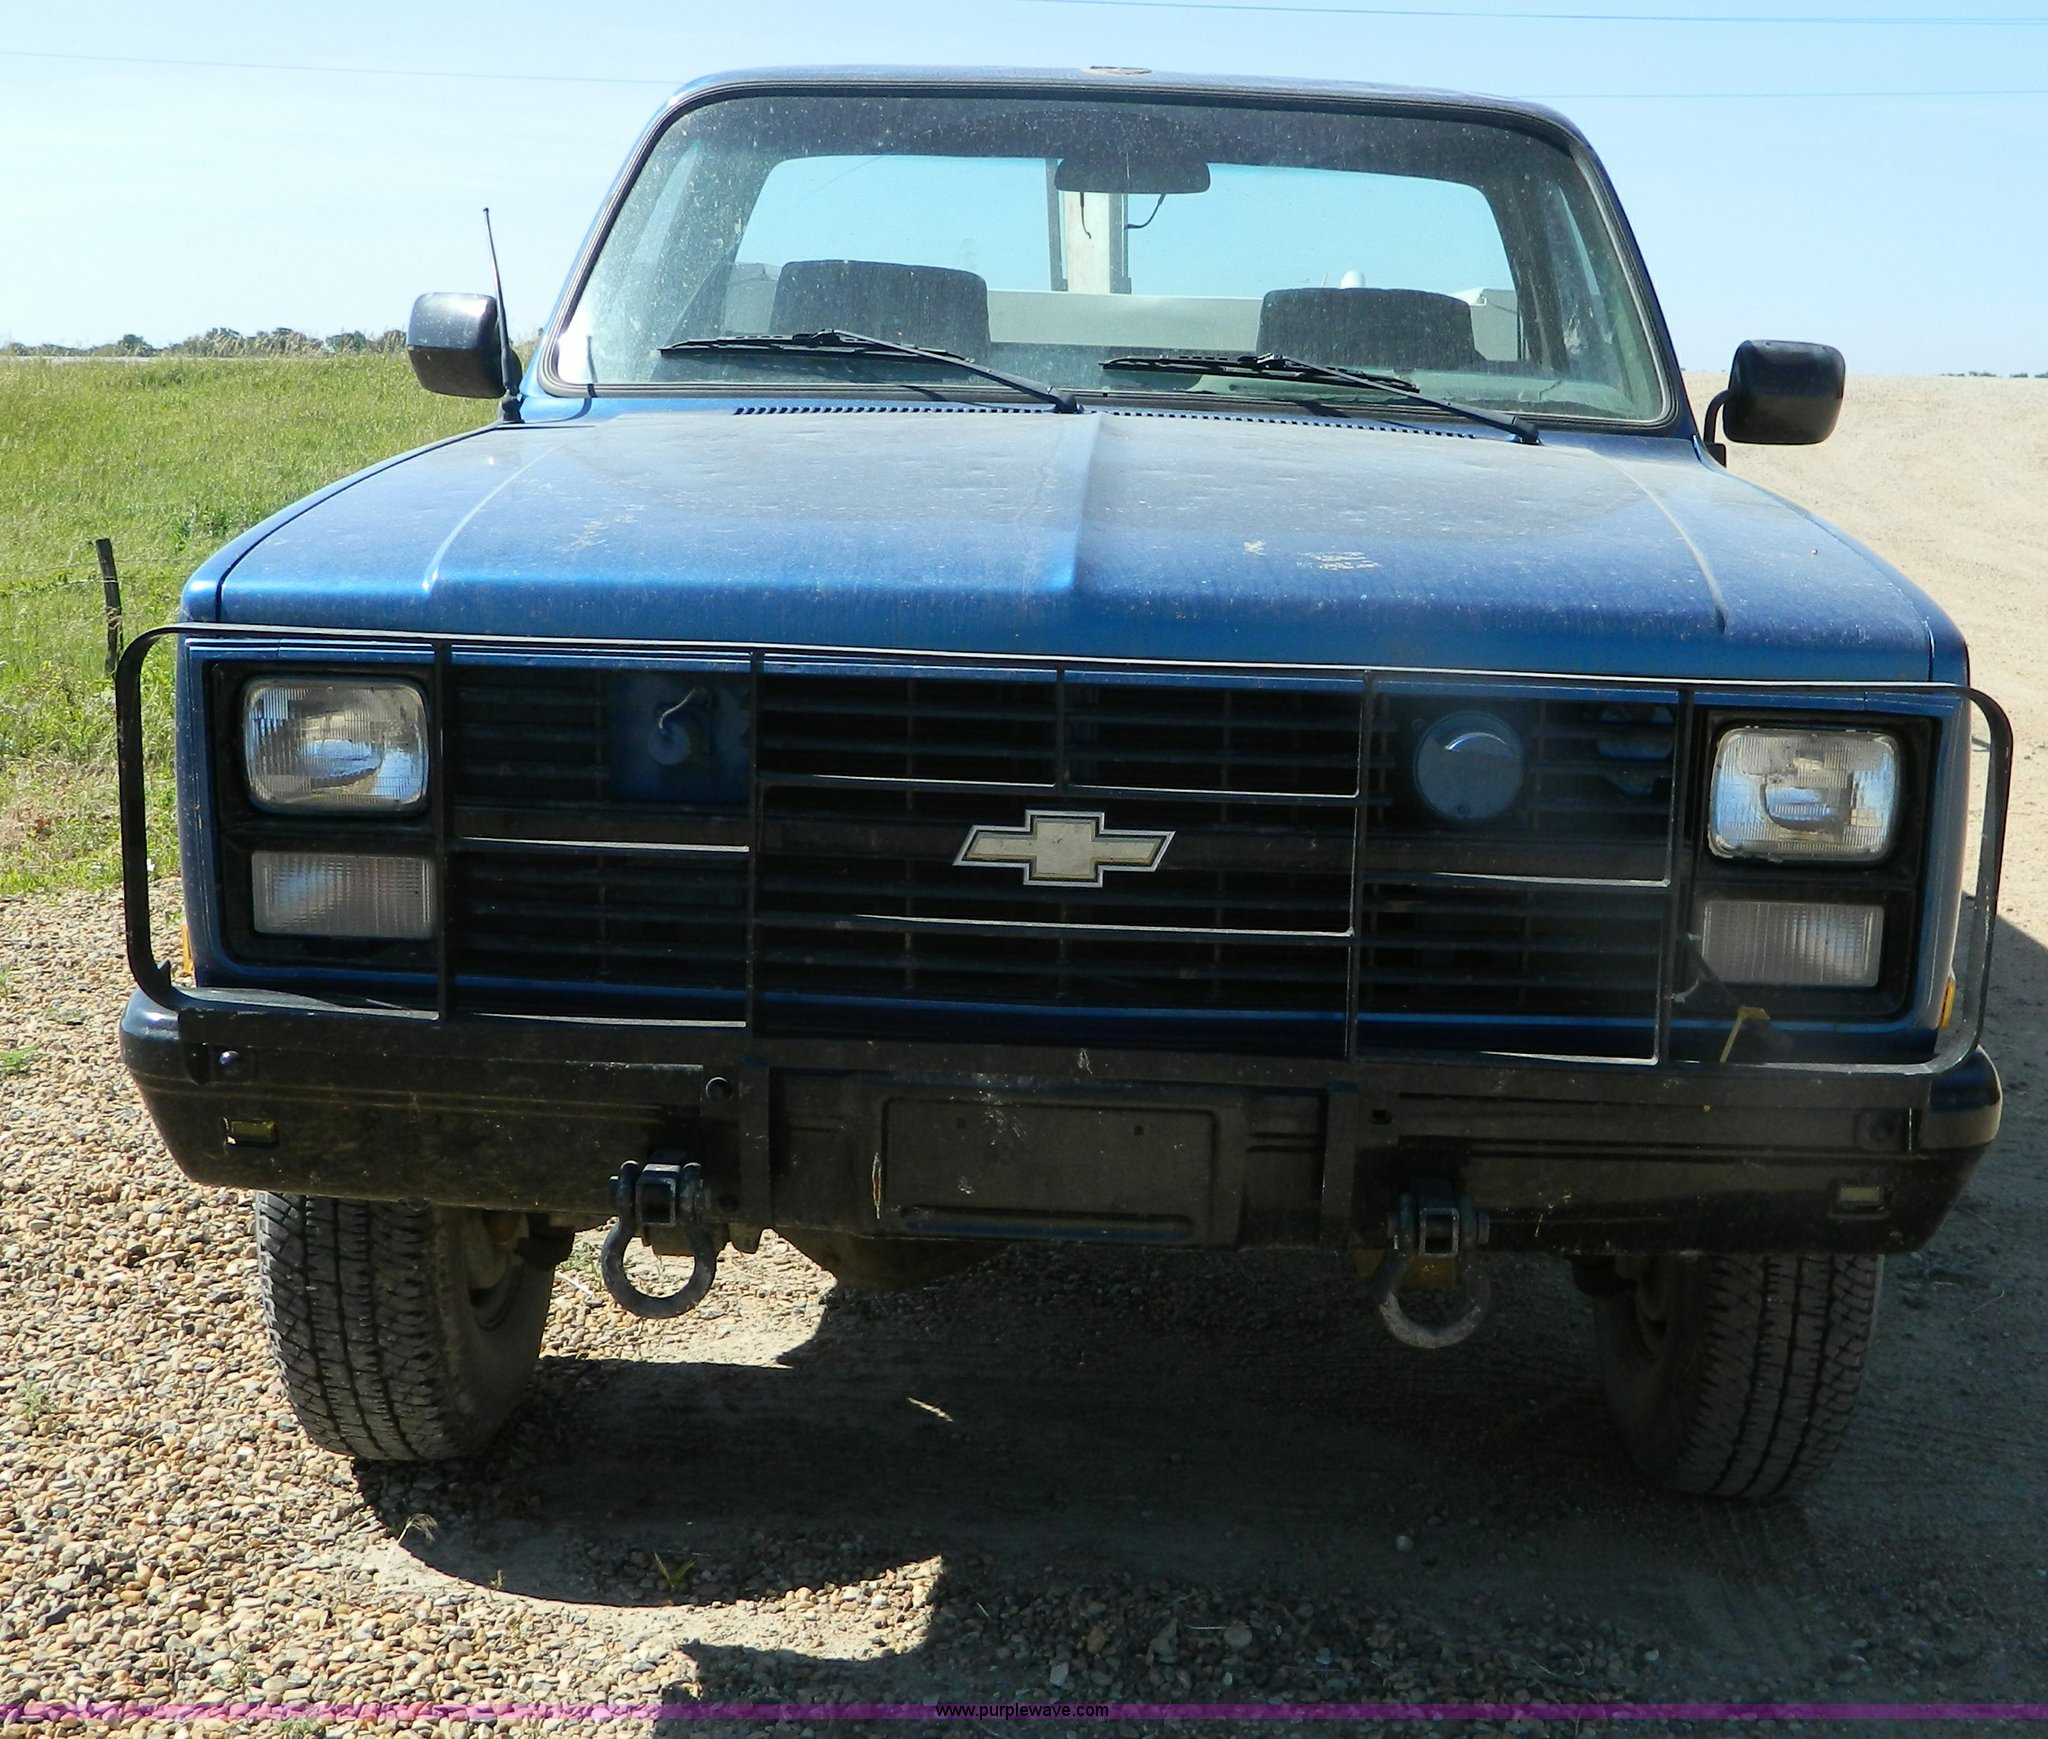 1984 Chevrolet 3/4 ton military truck | Item B3734 | SOLD! J